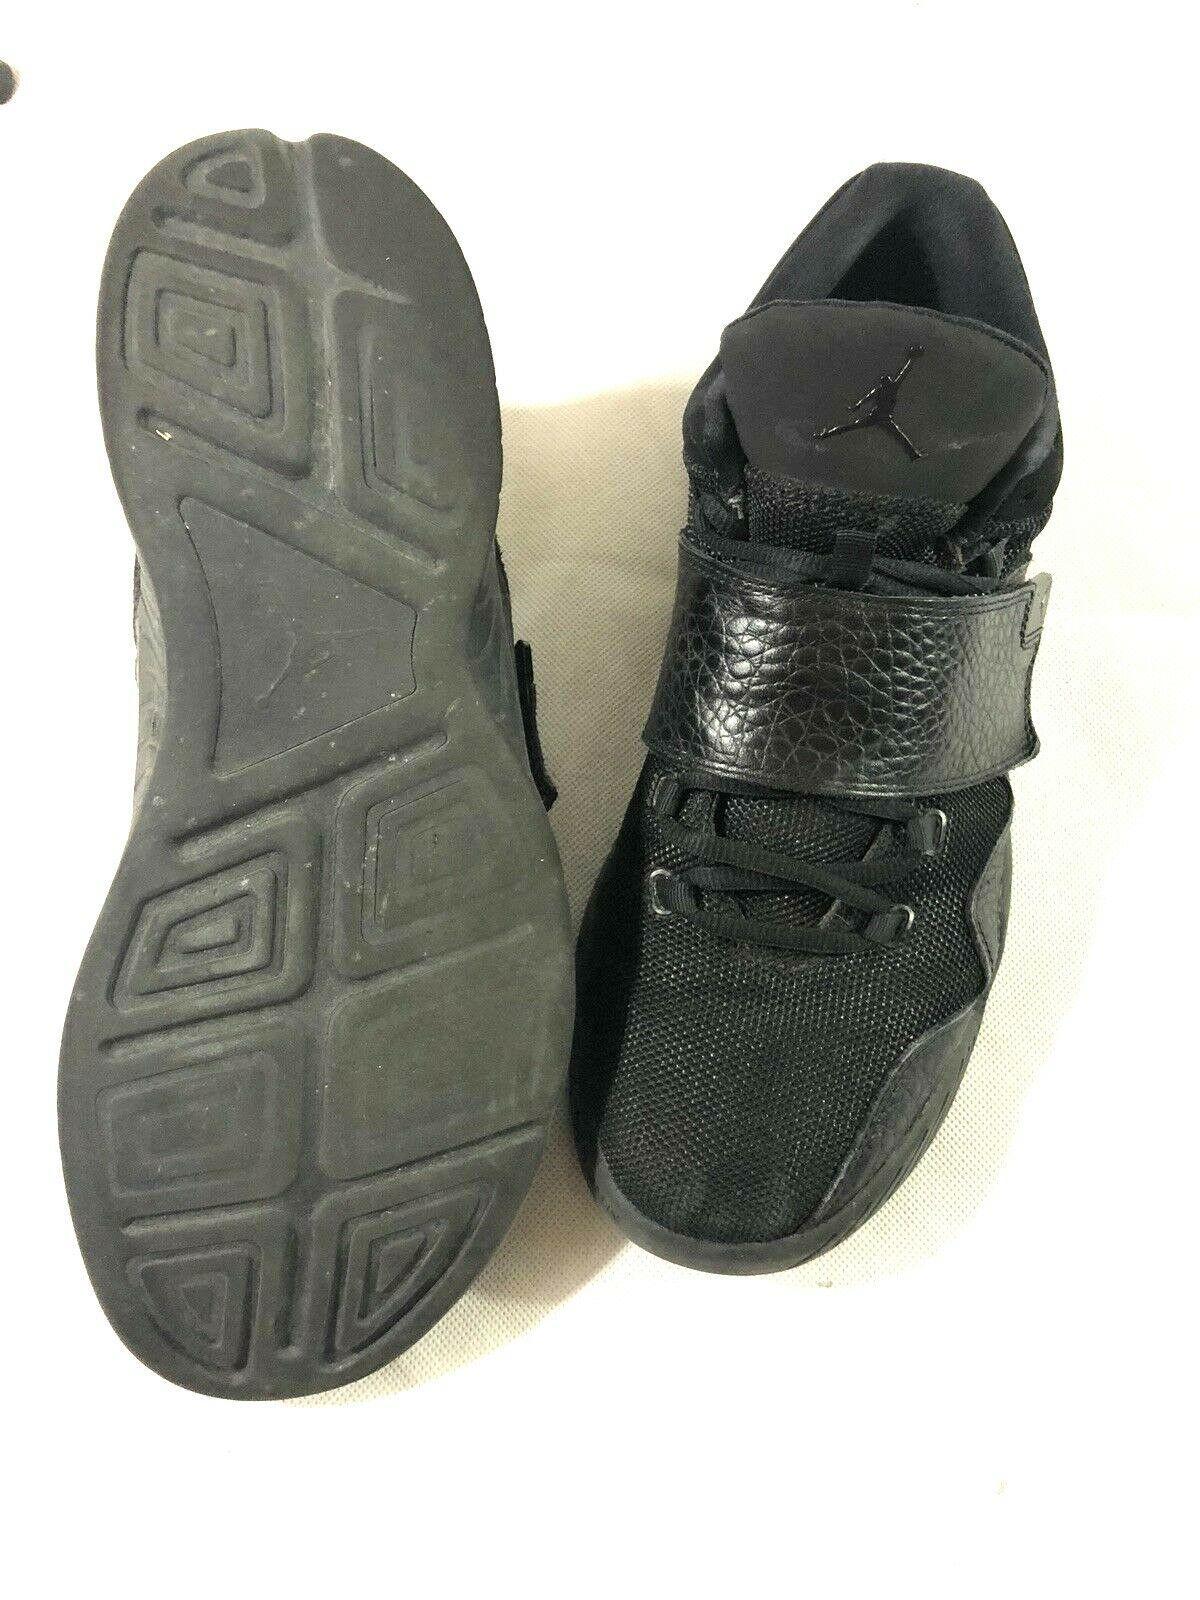 Nike Air Jordans 854557-001 Black 12 image 8